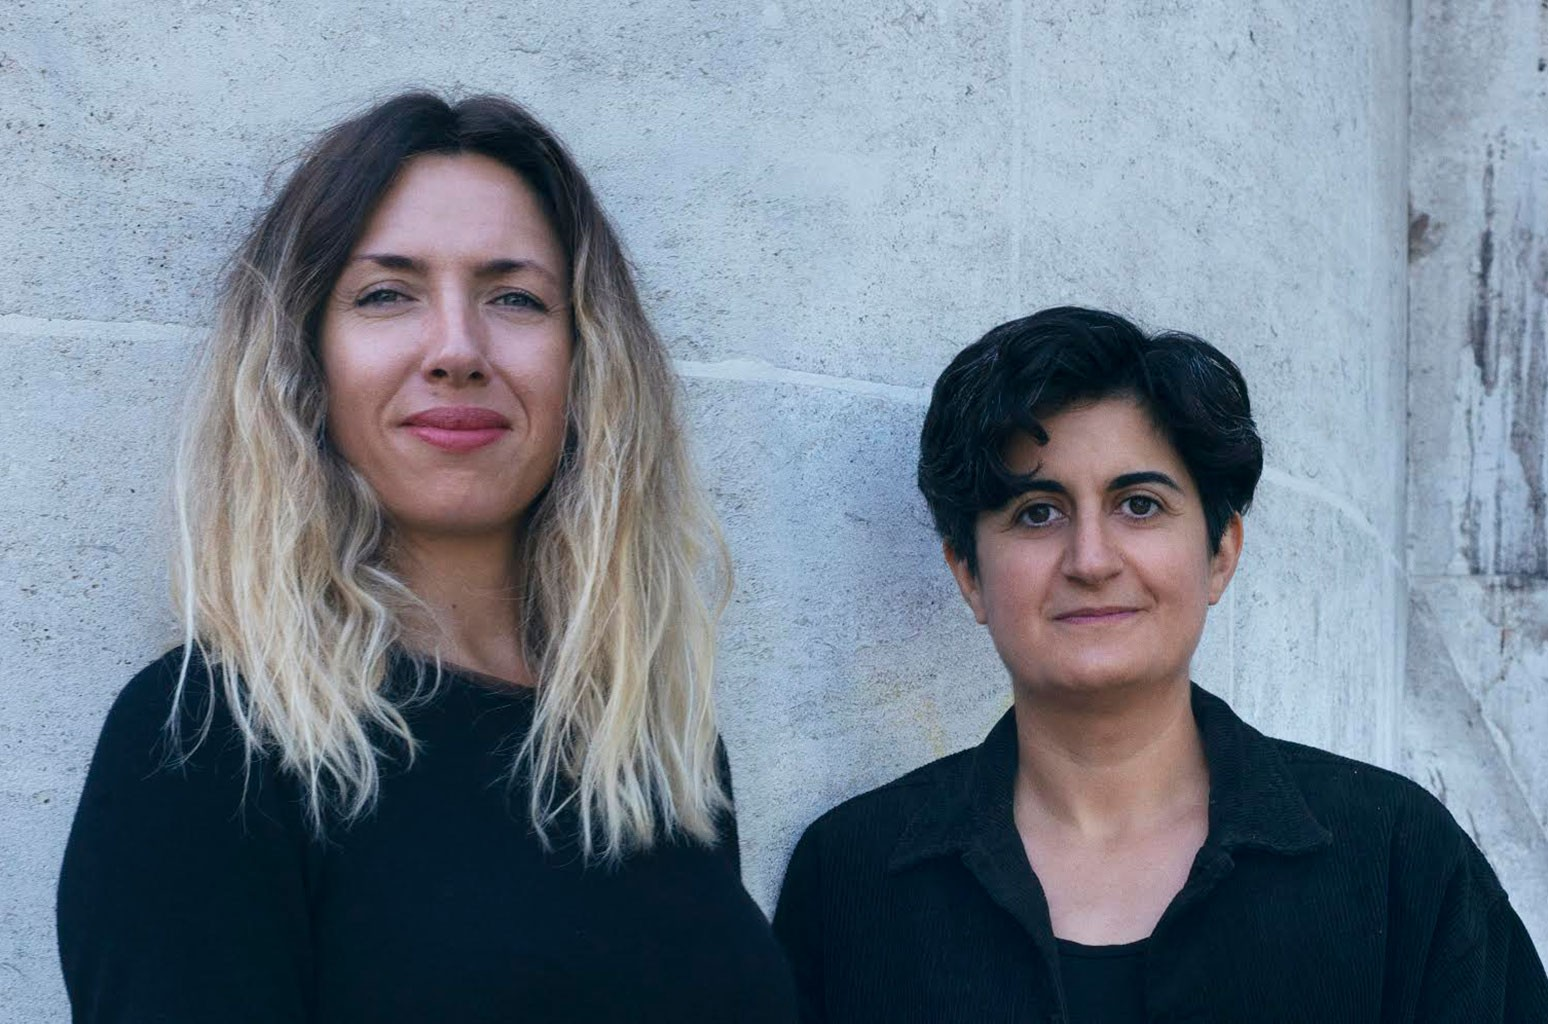 Ханна Нивс из TaP Music и Ази Эфтехари из YouTube запускают новое креативное агентство